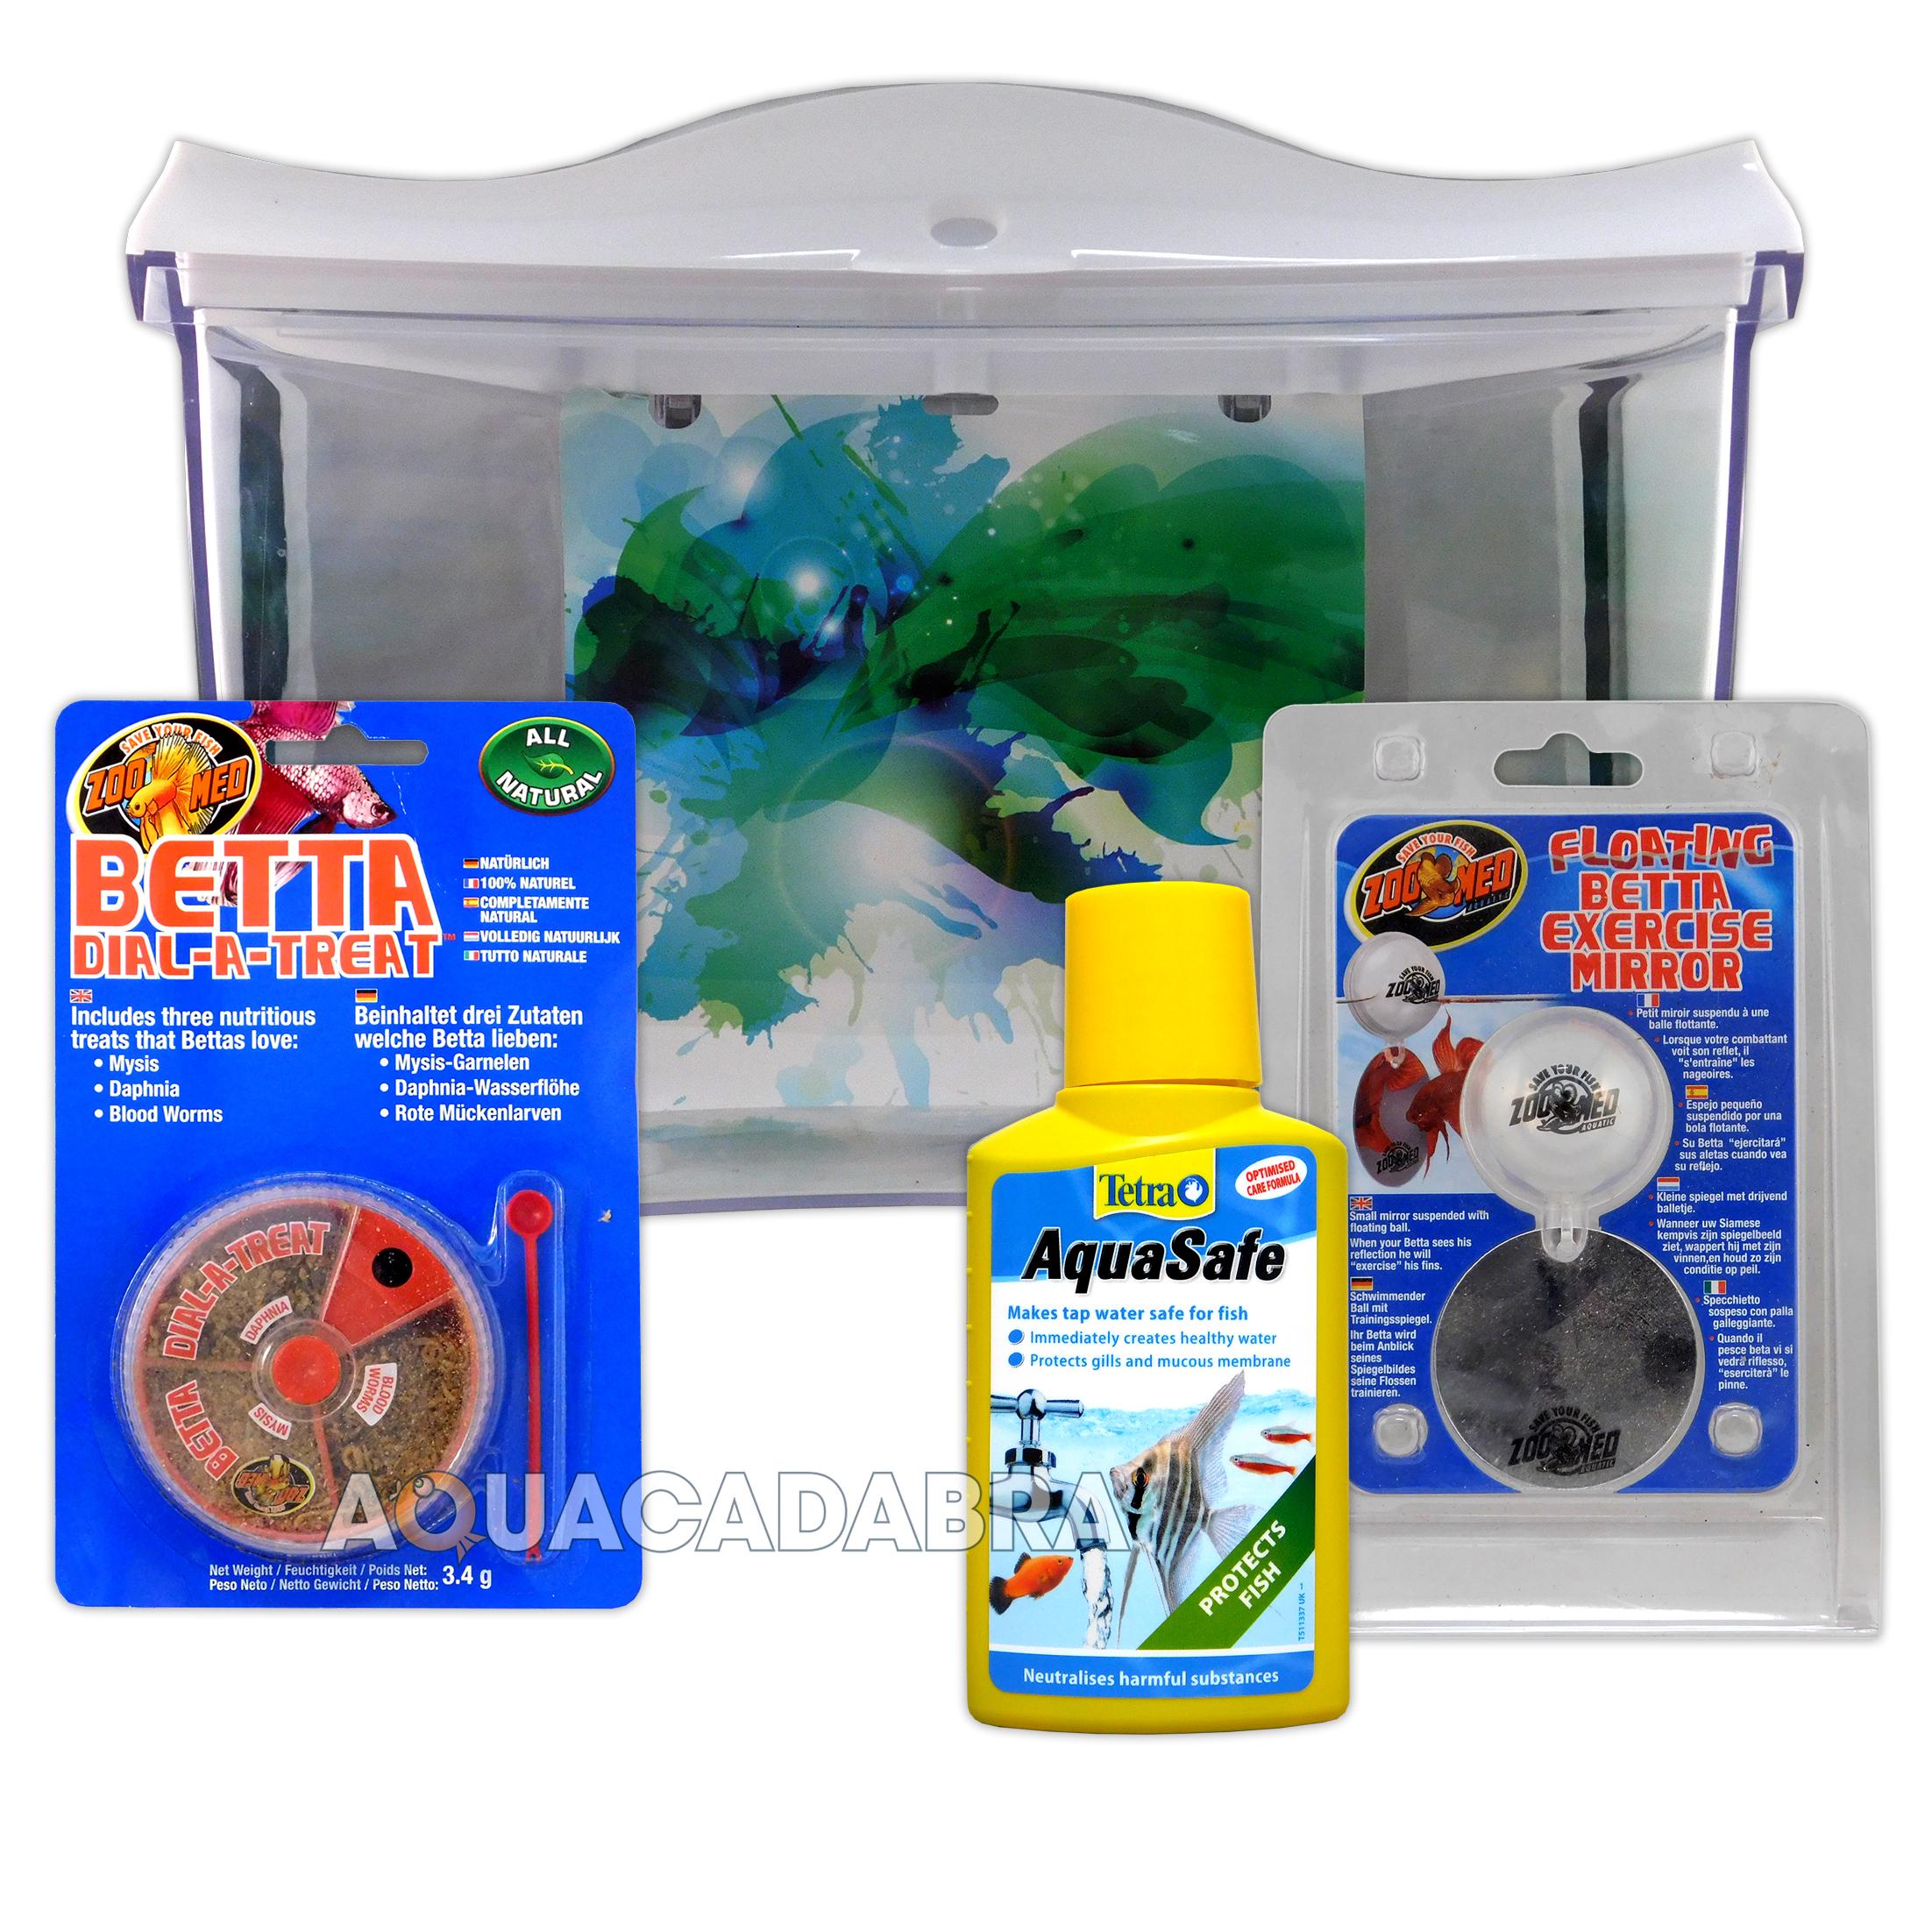 Complete siamese fighter starter betta aquarium kit tank for Fish tank kits